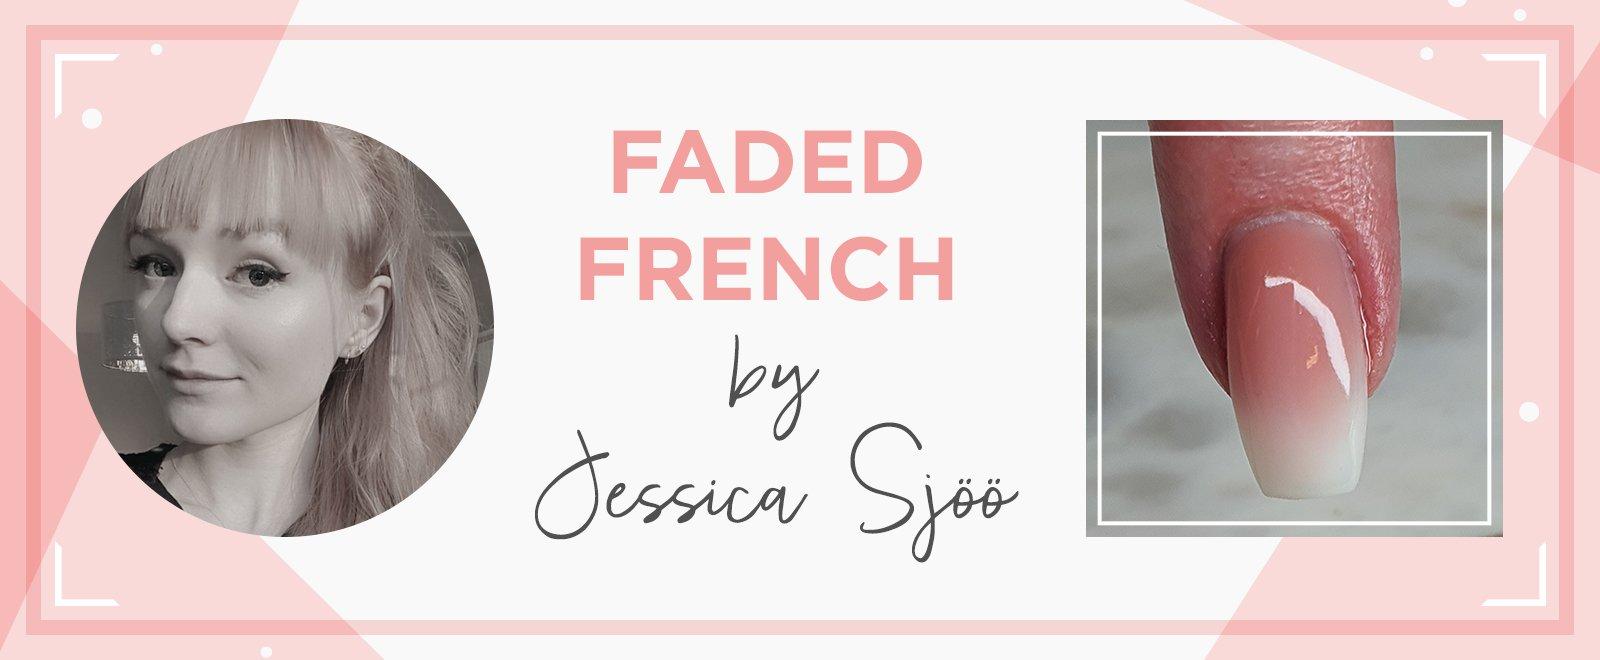 SBS_header_template_1600x660_faded-french_Jessica-Sjöö